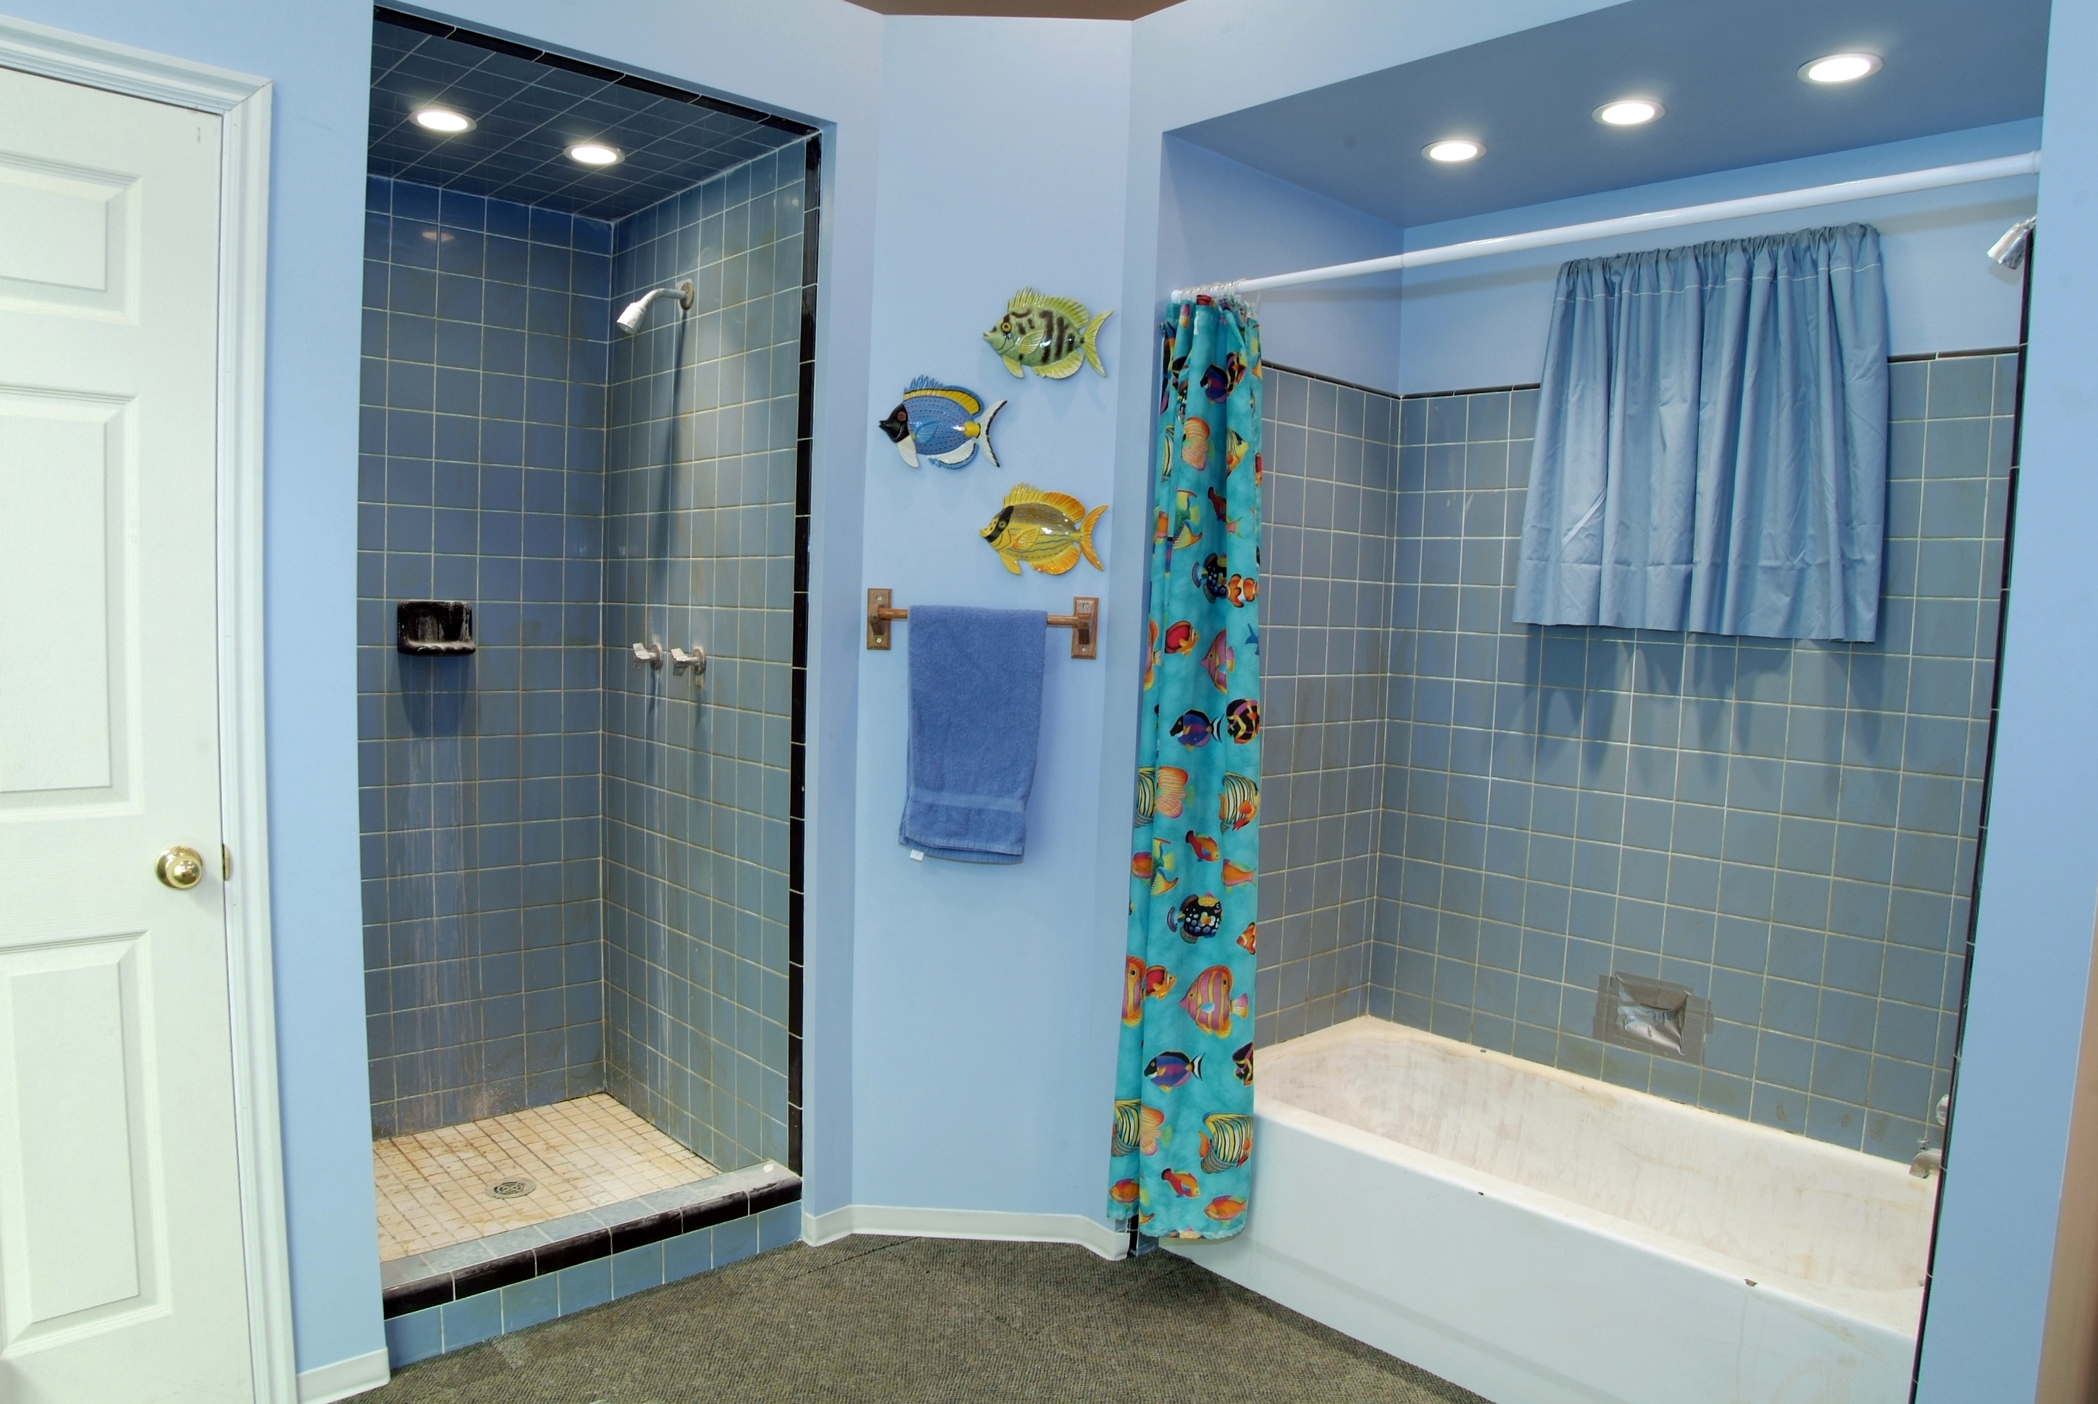 Bathcrest Of Wichita 11426 E Pawnee St Wichita Ks 67207